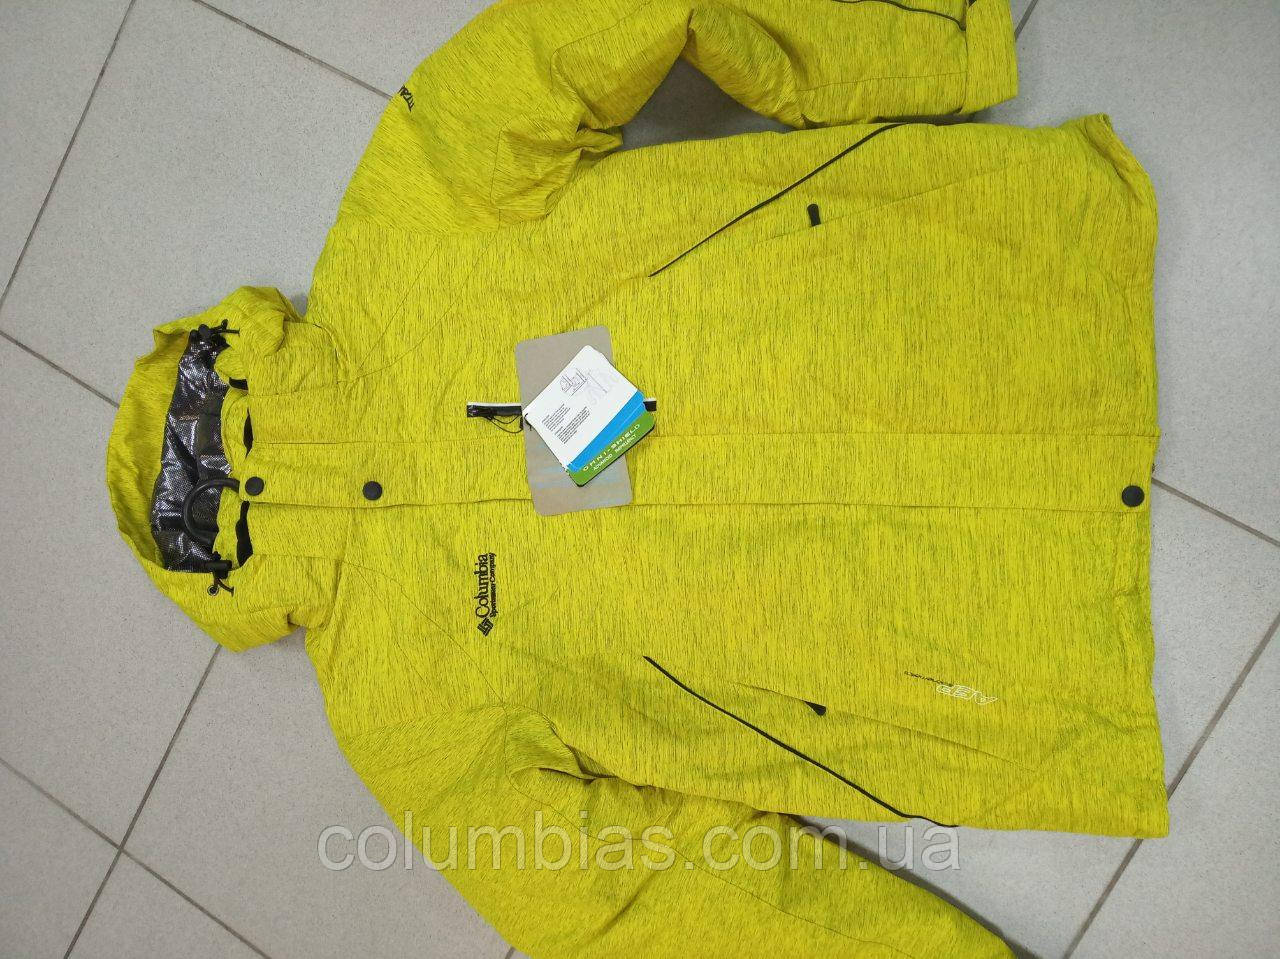 Зимние куртки Columbia оптом много разцветок и моделей